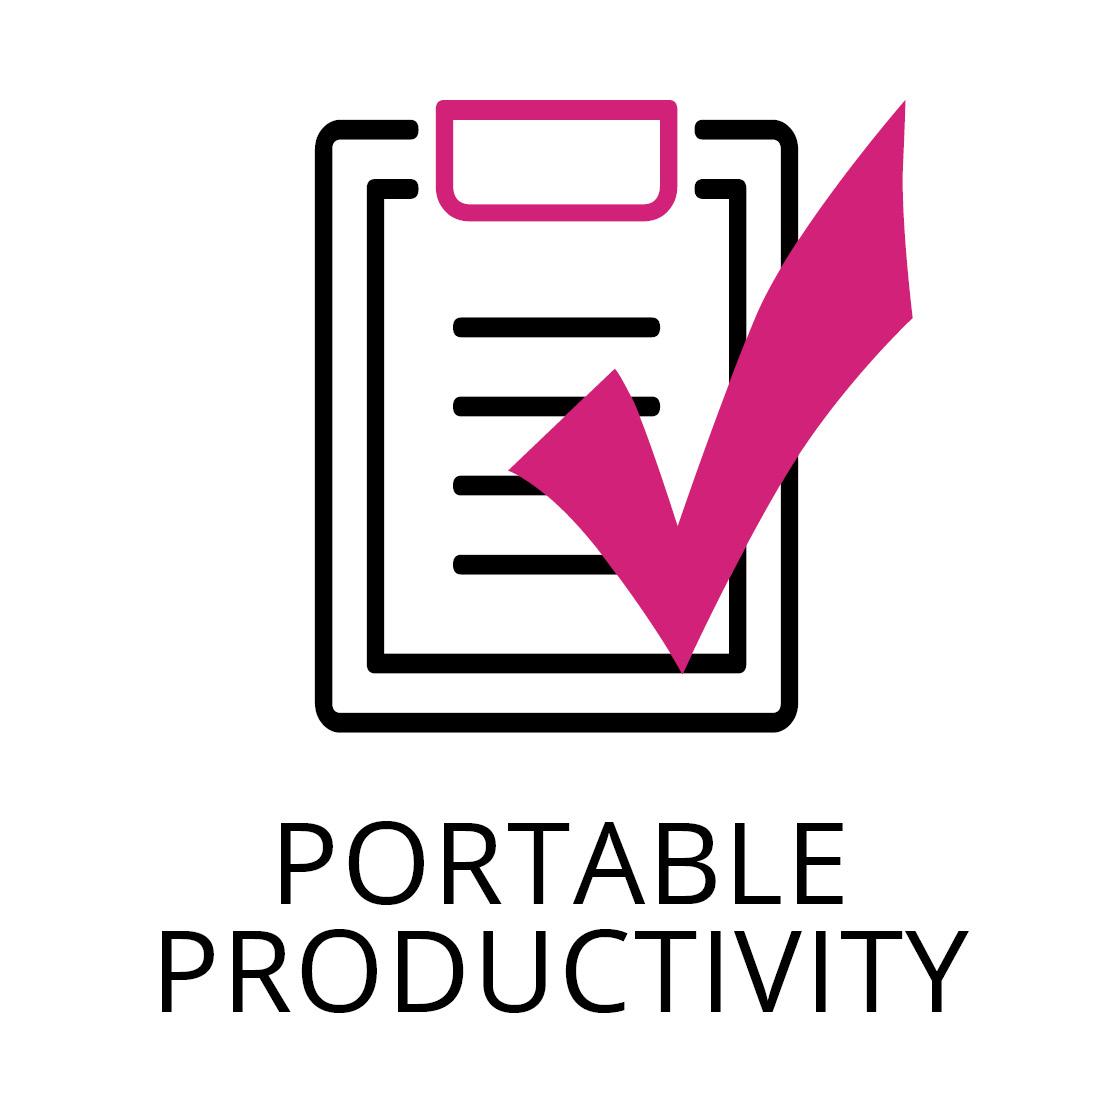 PORTABLE PRODUCTIVITY